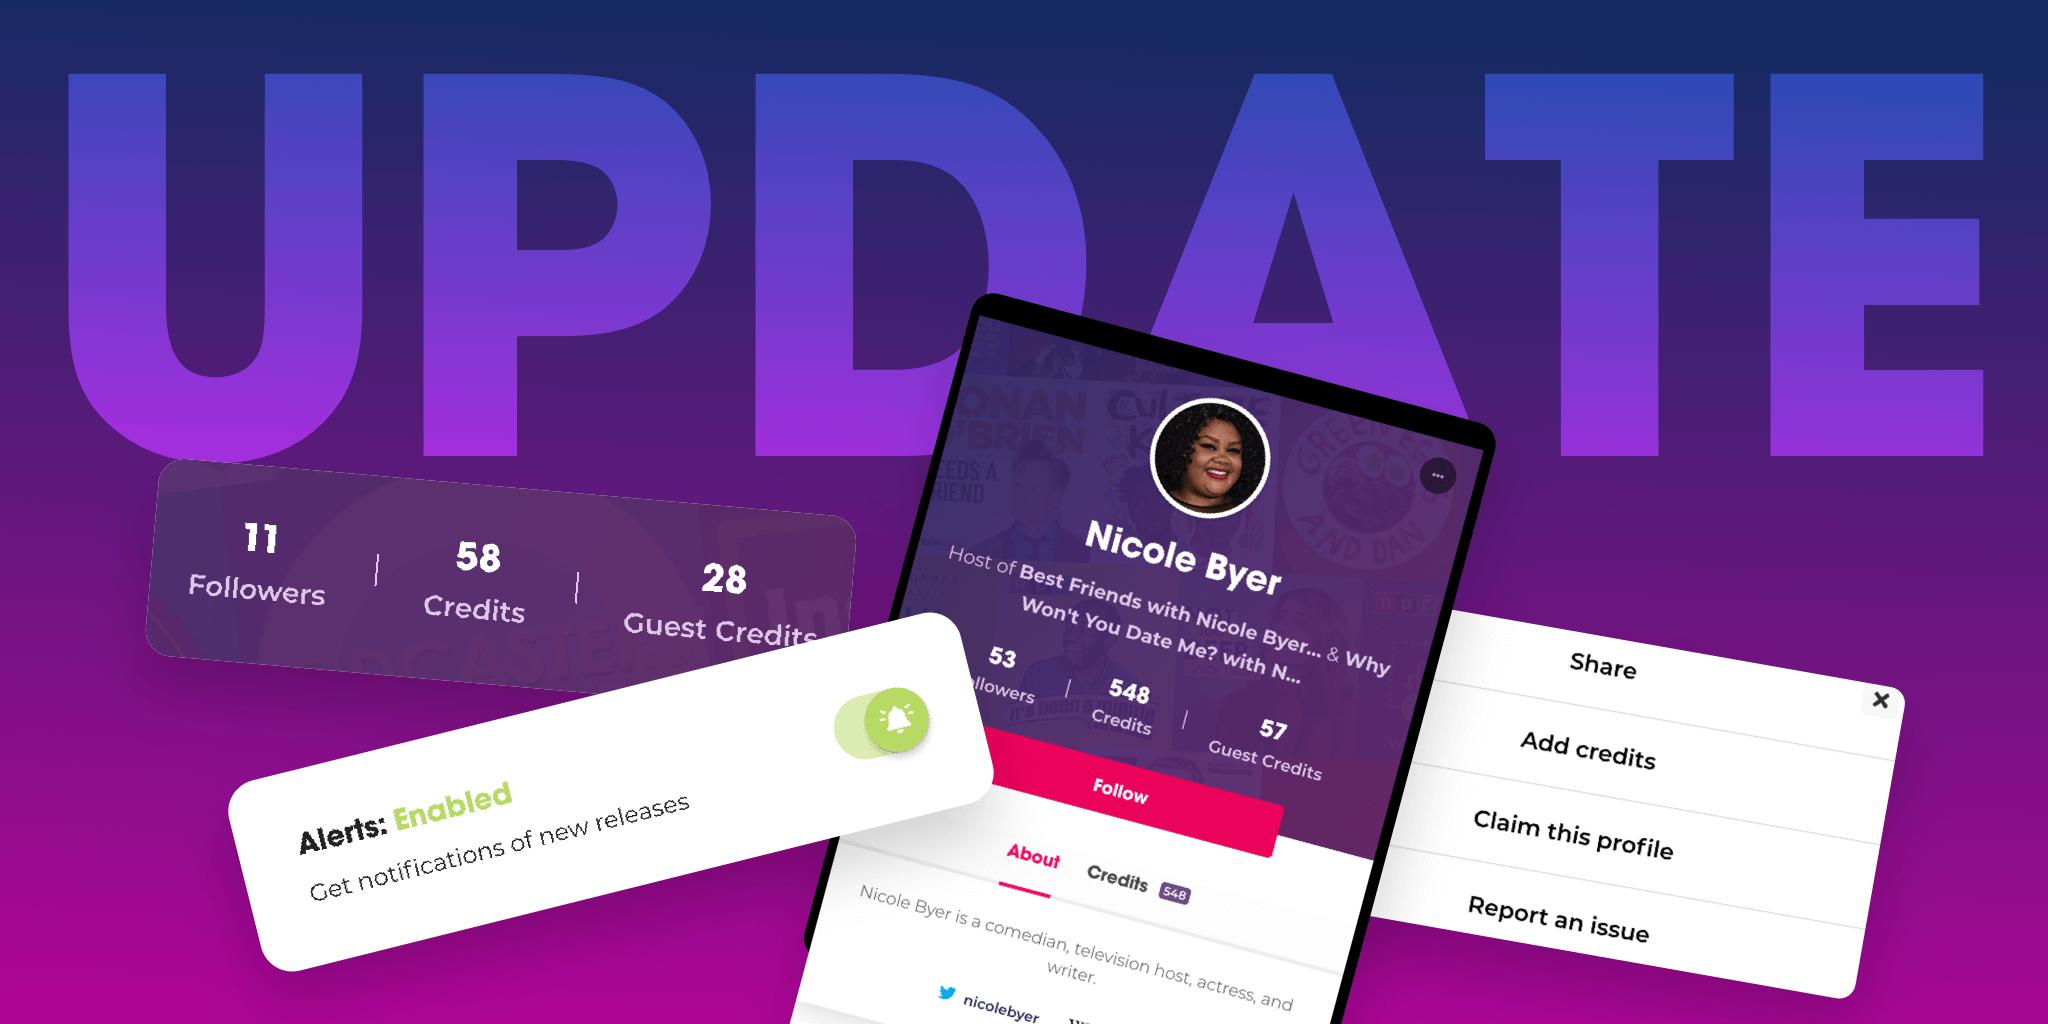 Podchaser Update: Creator Refresh, Alerts, & More!